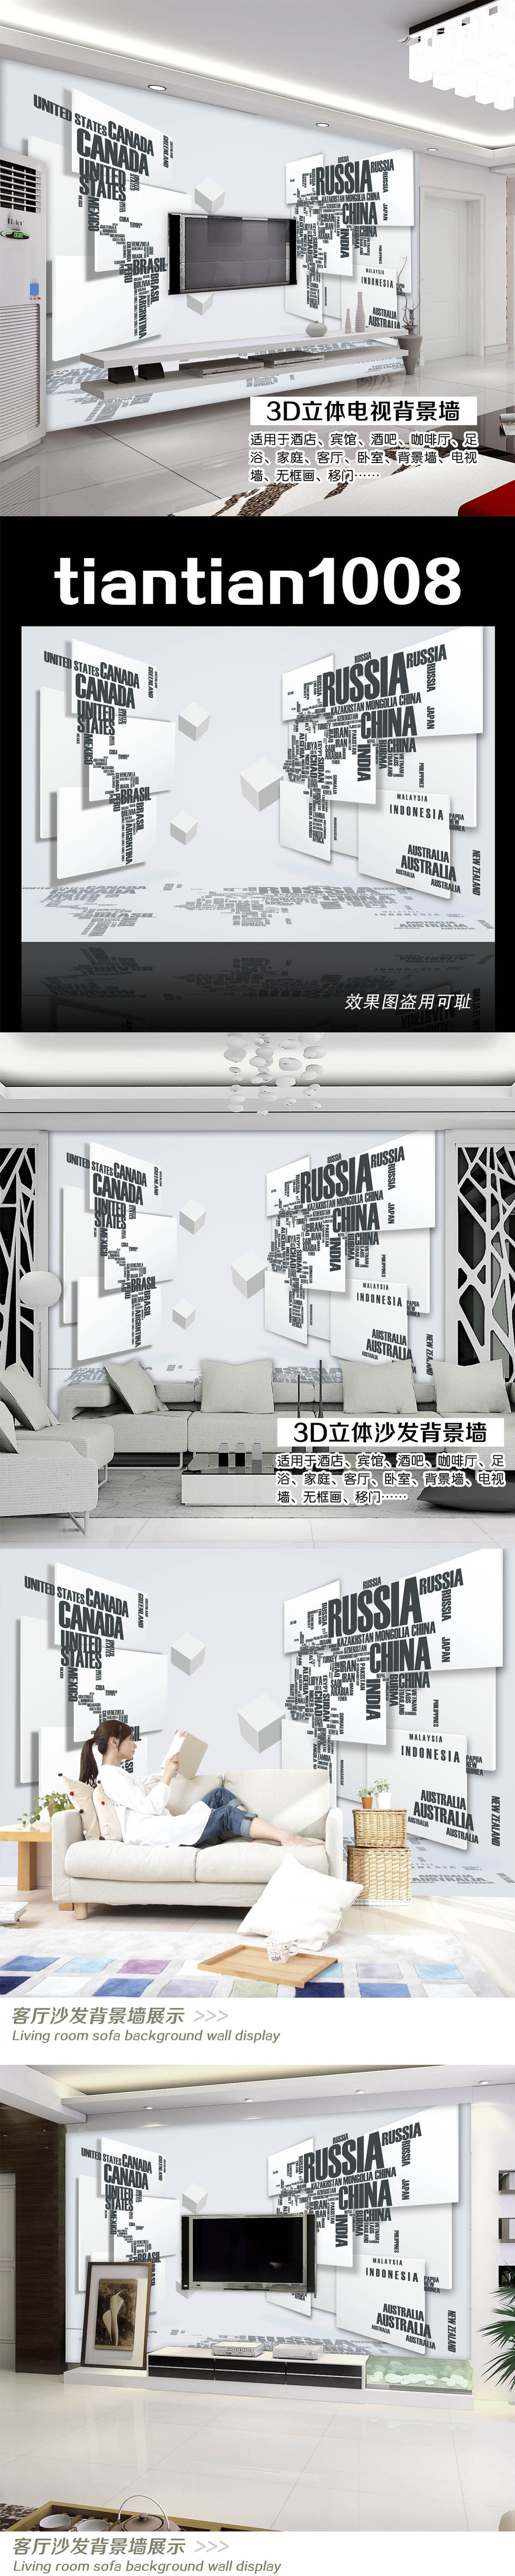 3d立体世界地图电视背景墙装饰画